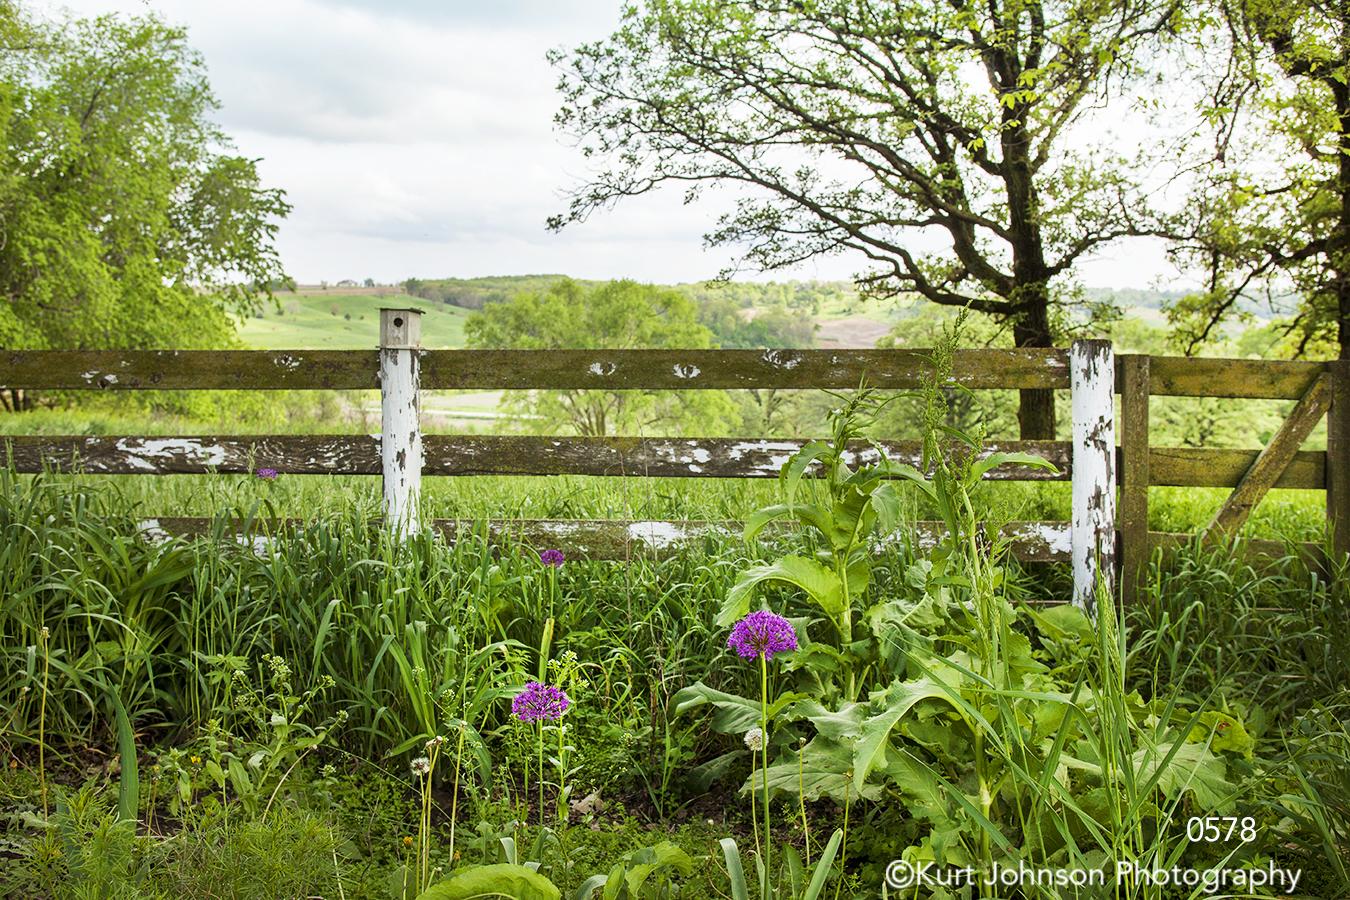 landscape grasses green fence rural trees